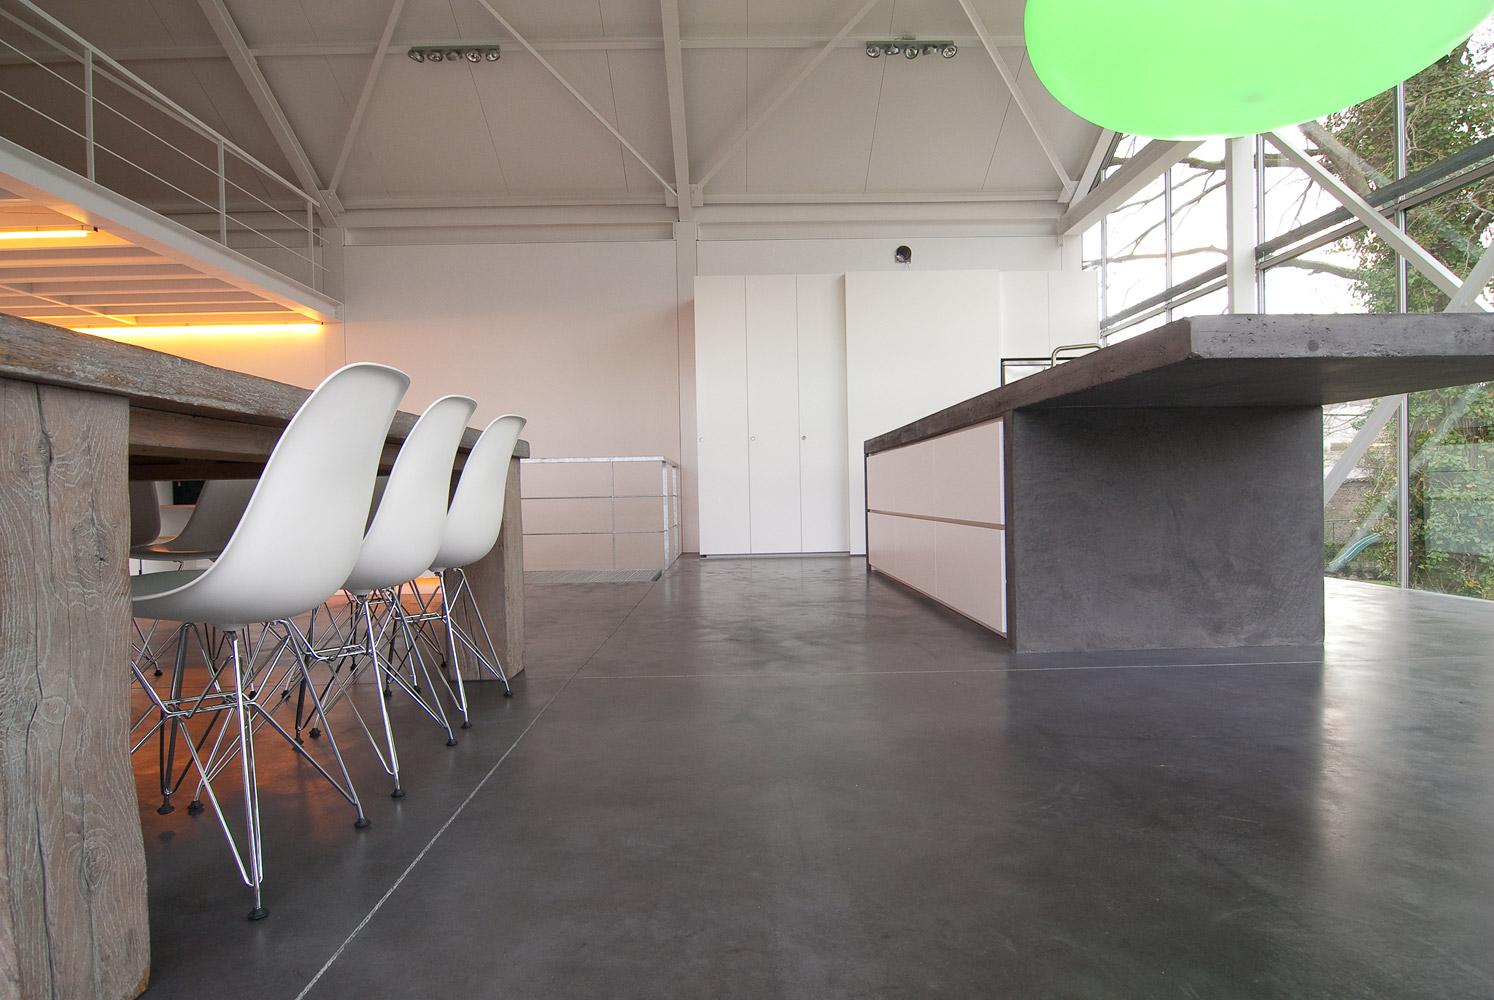 showcase greenhouse concrete kitchen table image